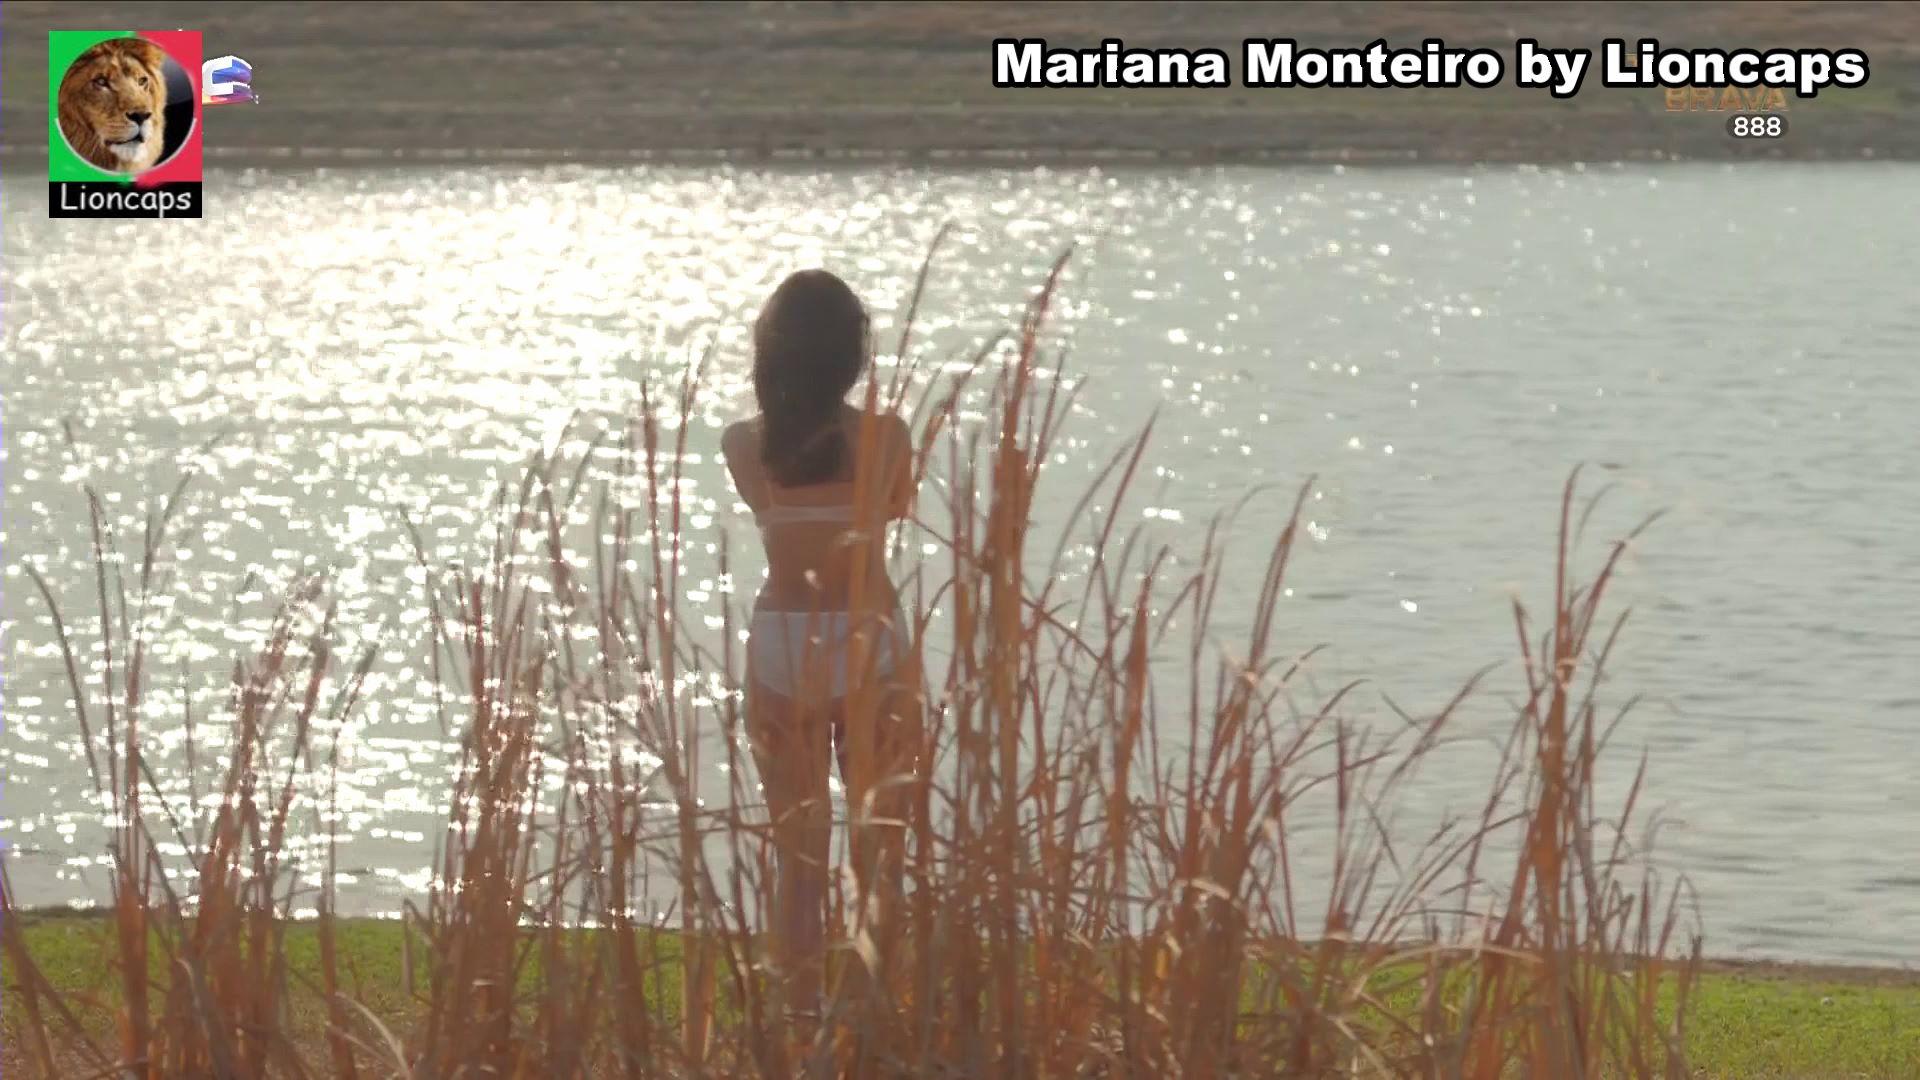 196459240_mariana_monteiro_vs191201_0325_122_539lo.JPG